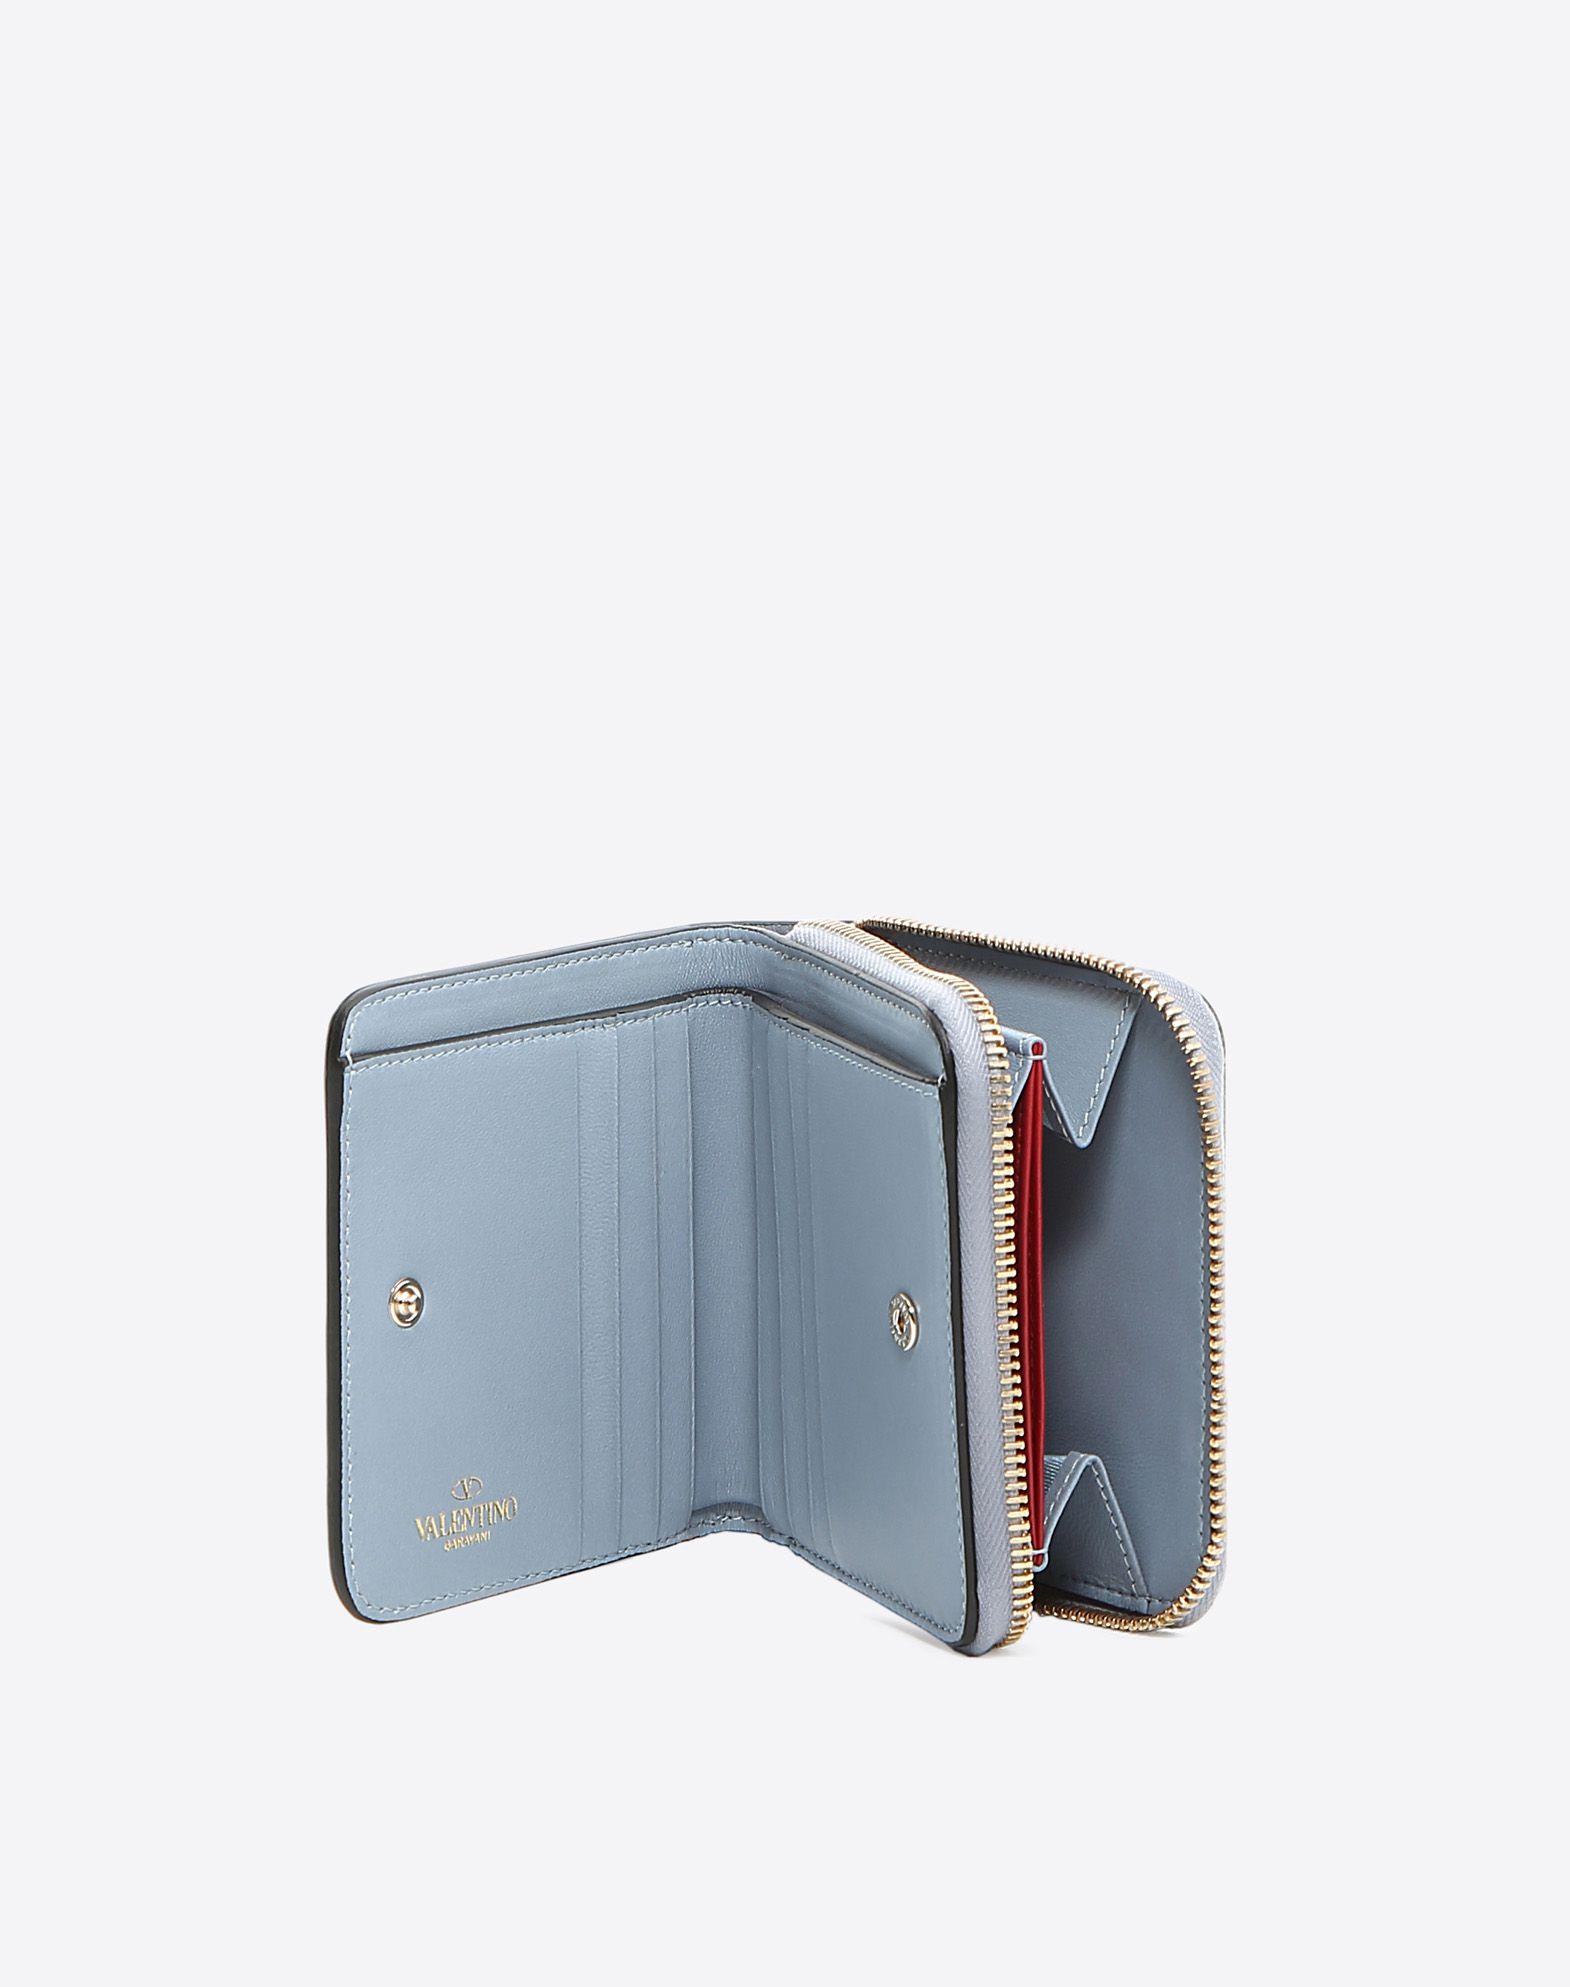 VALENTINO Studs Solid colour Zip closure Internal card slots  46506144kp